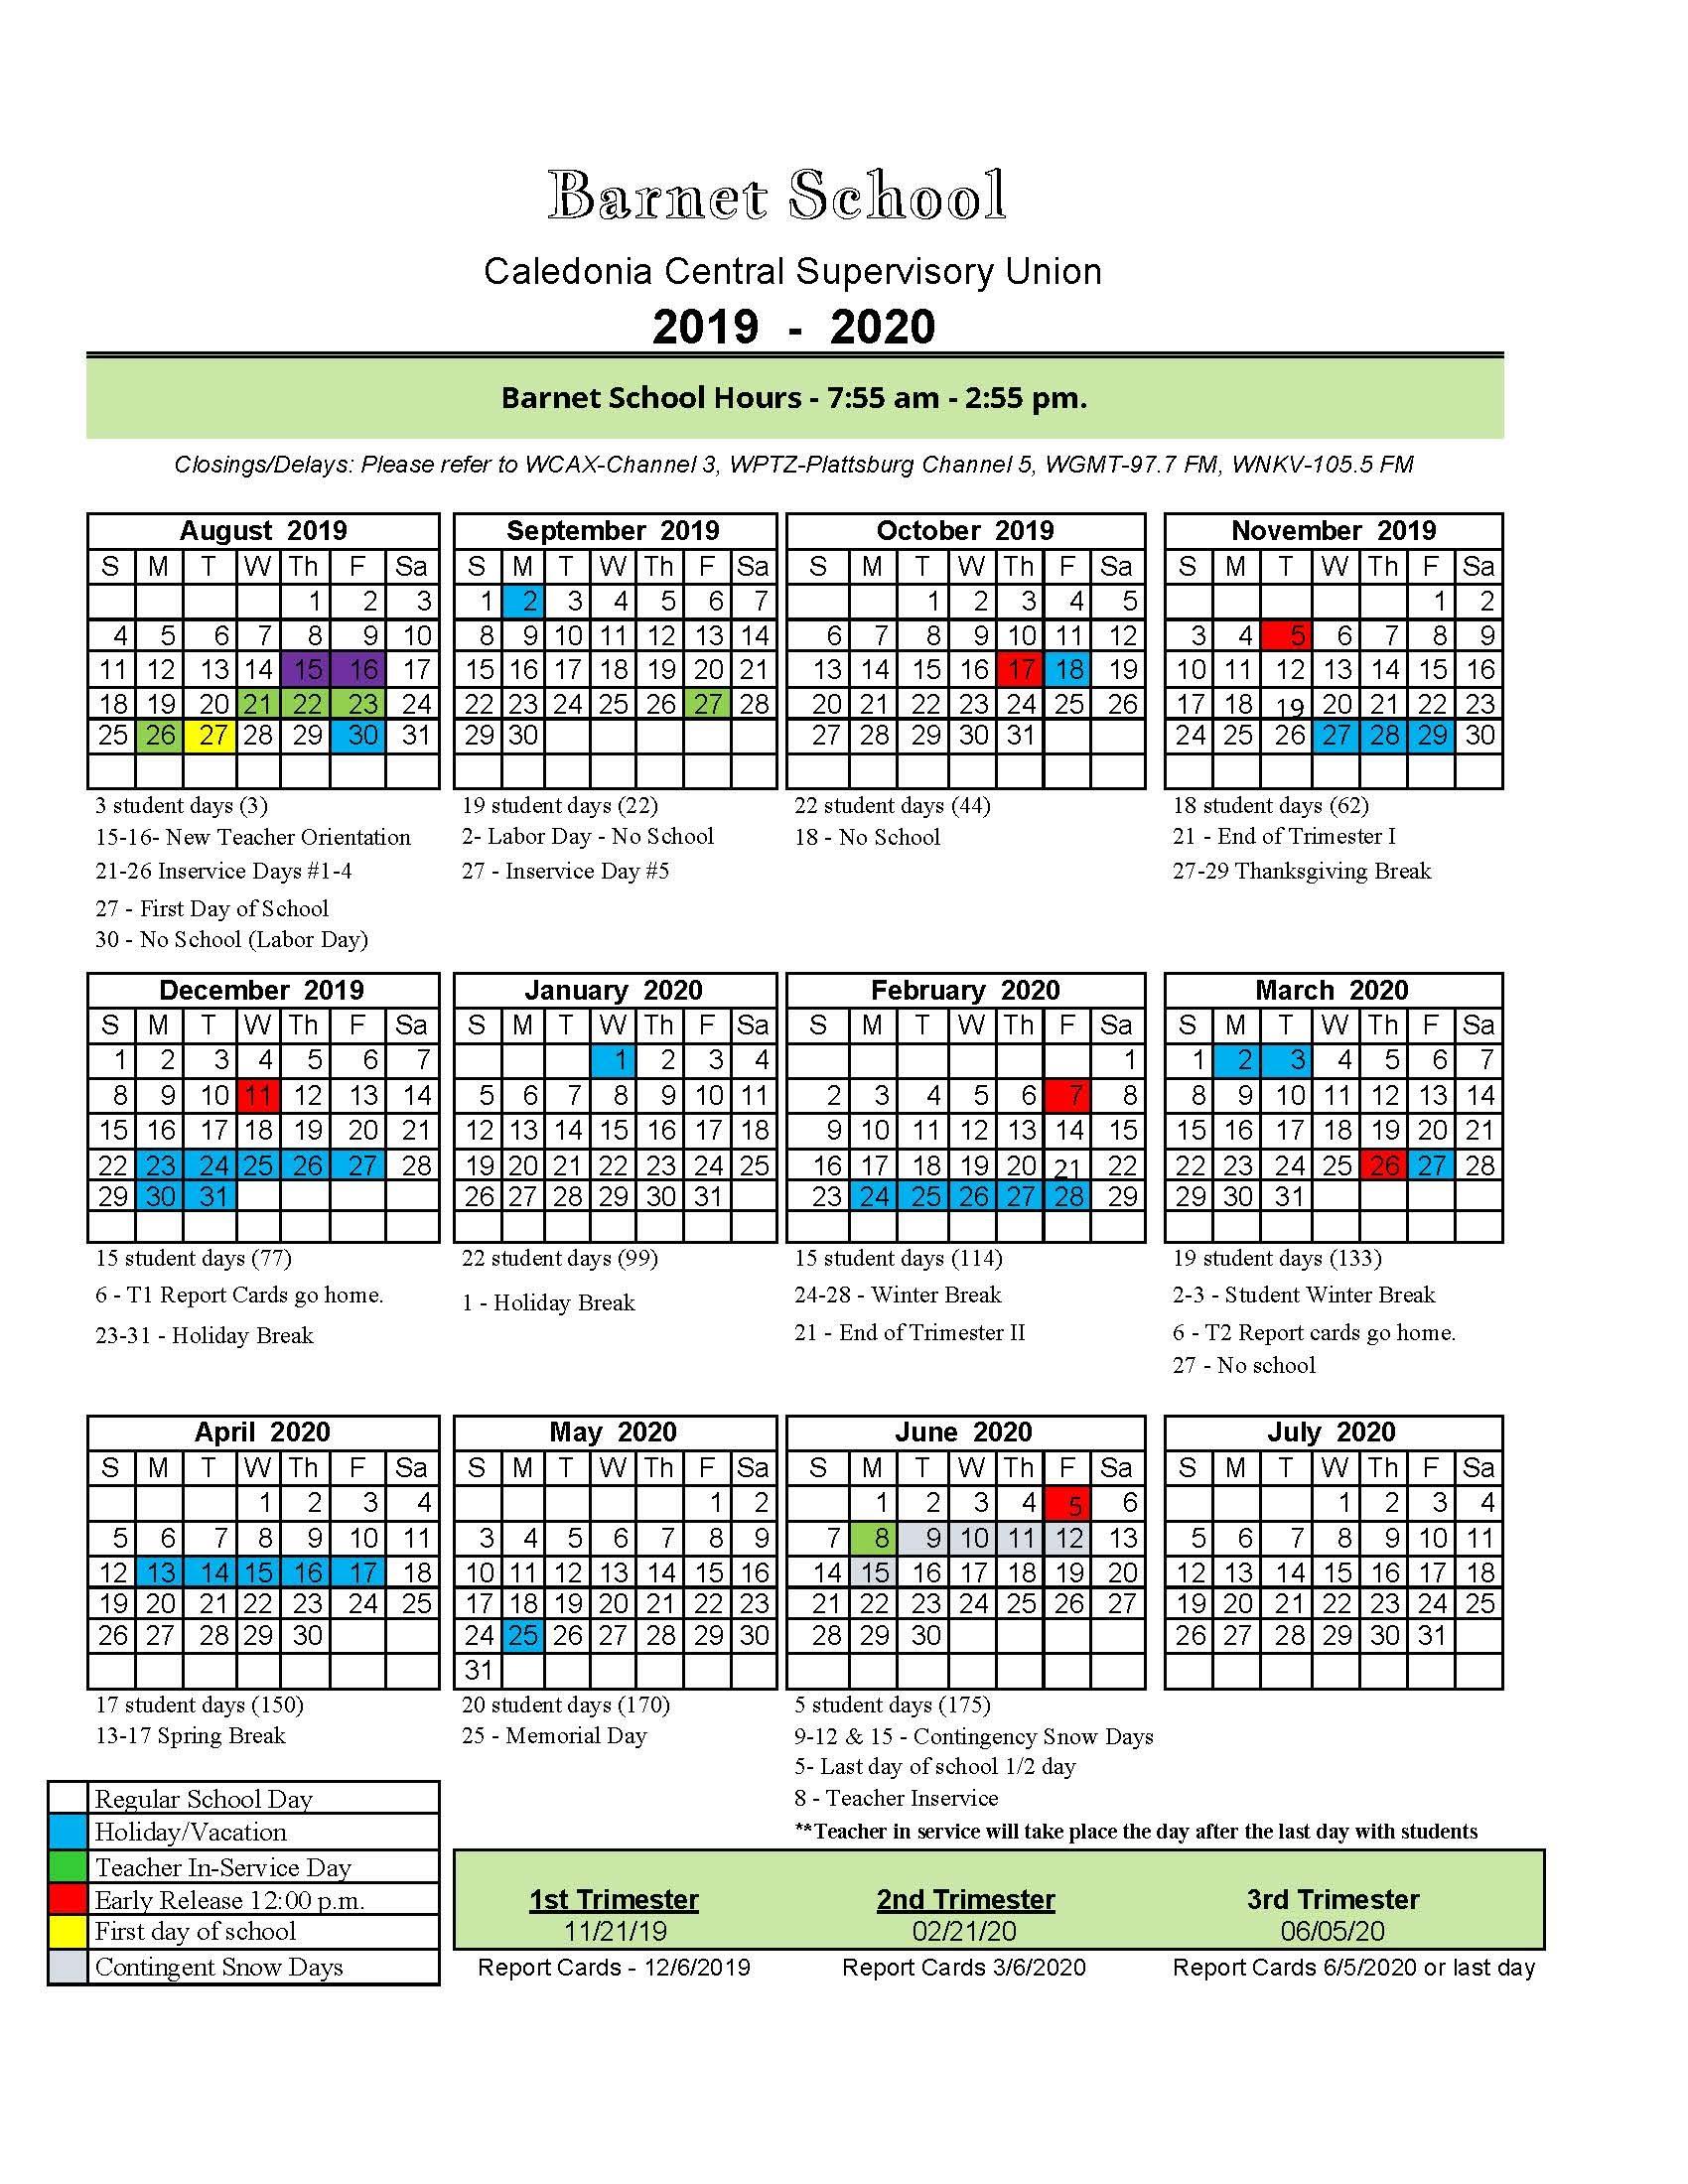 Uvm Calendar 2020 2019 20 School Calendar   BarSchool